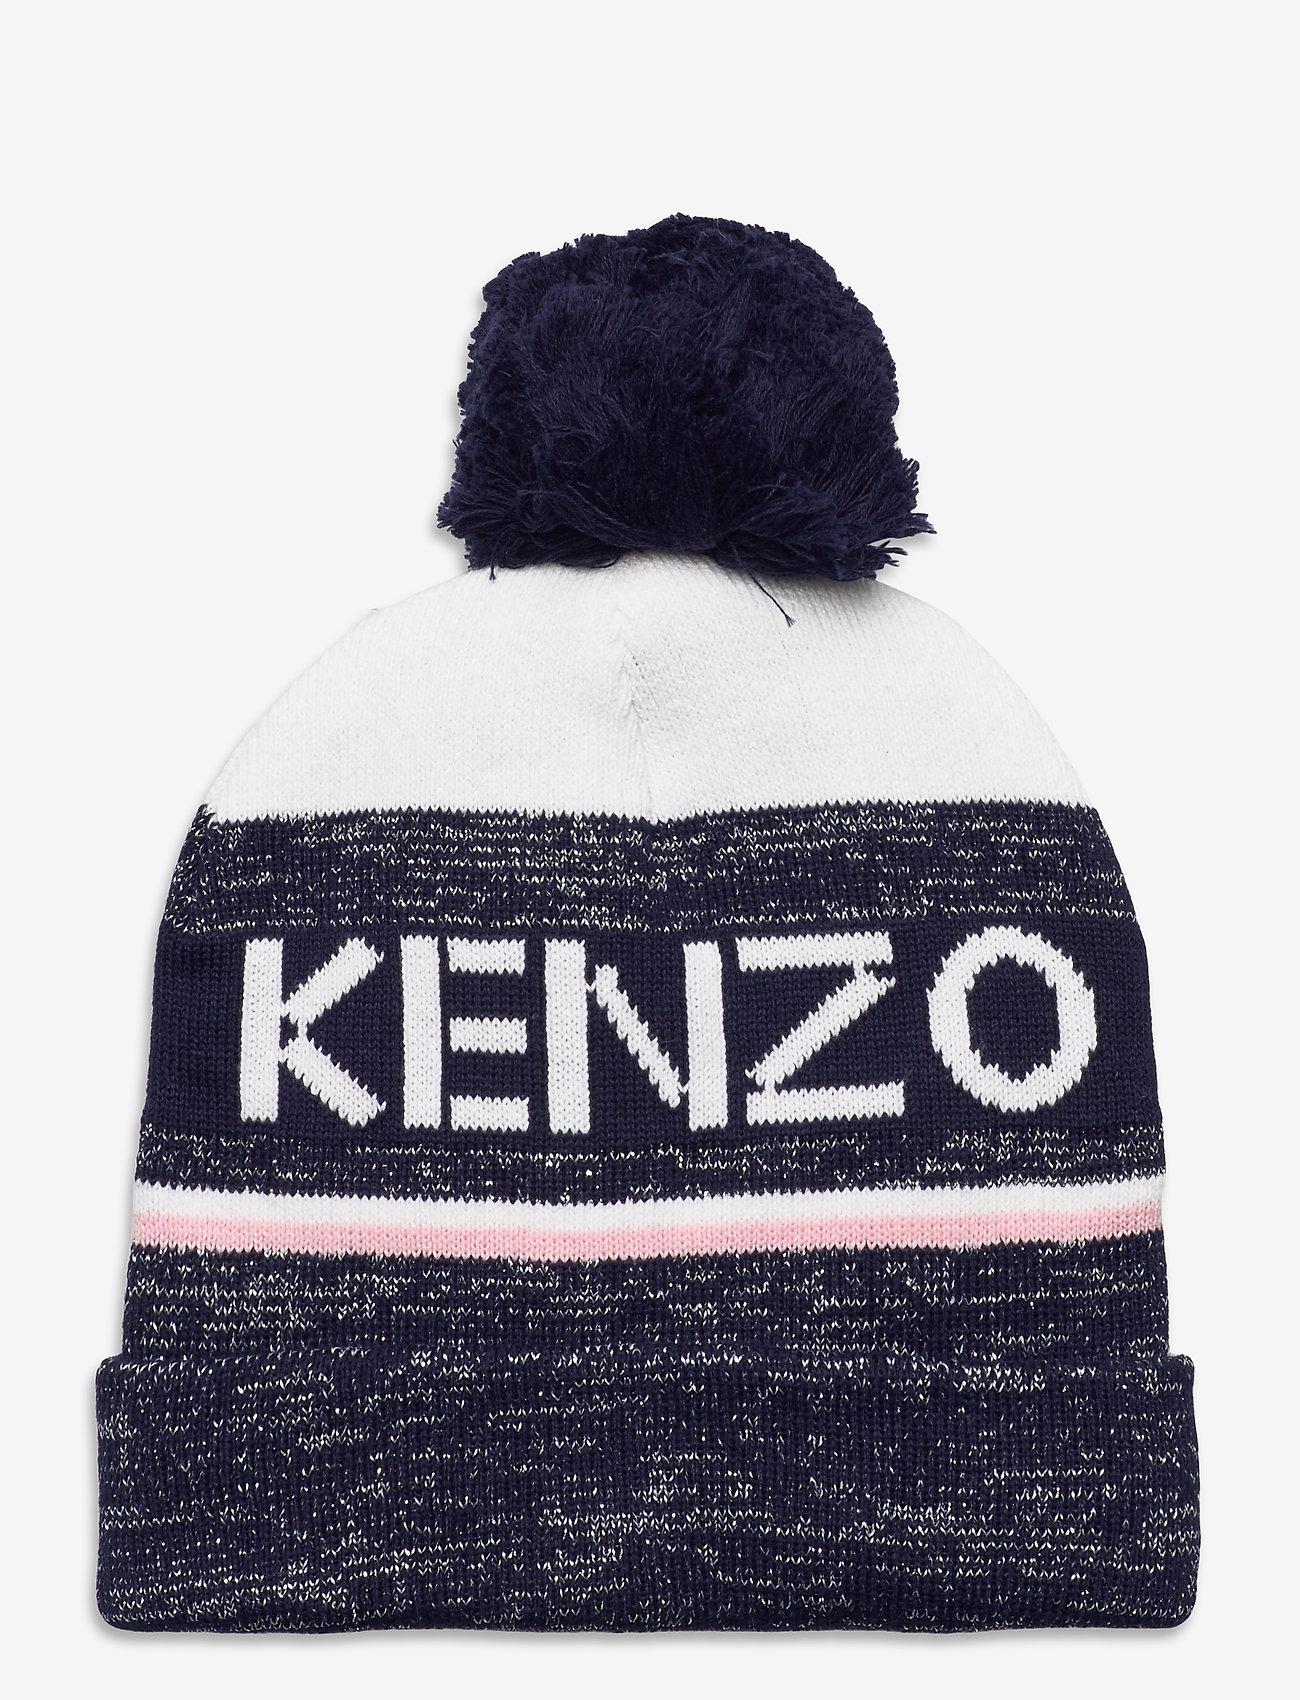 Kenzo - PULL ON HAT - huer - navy - 0